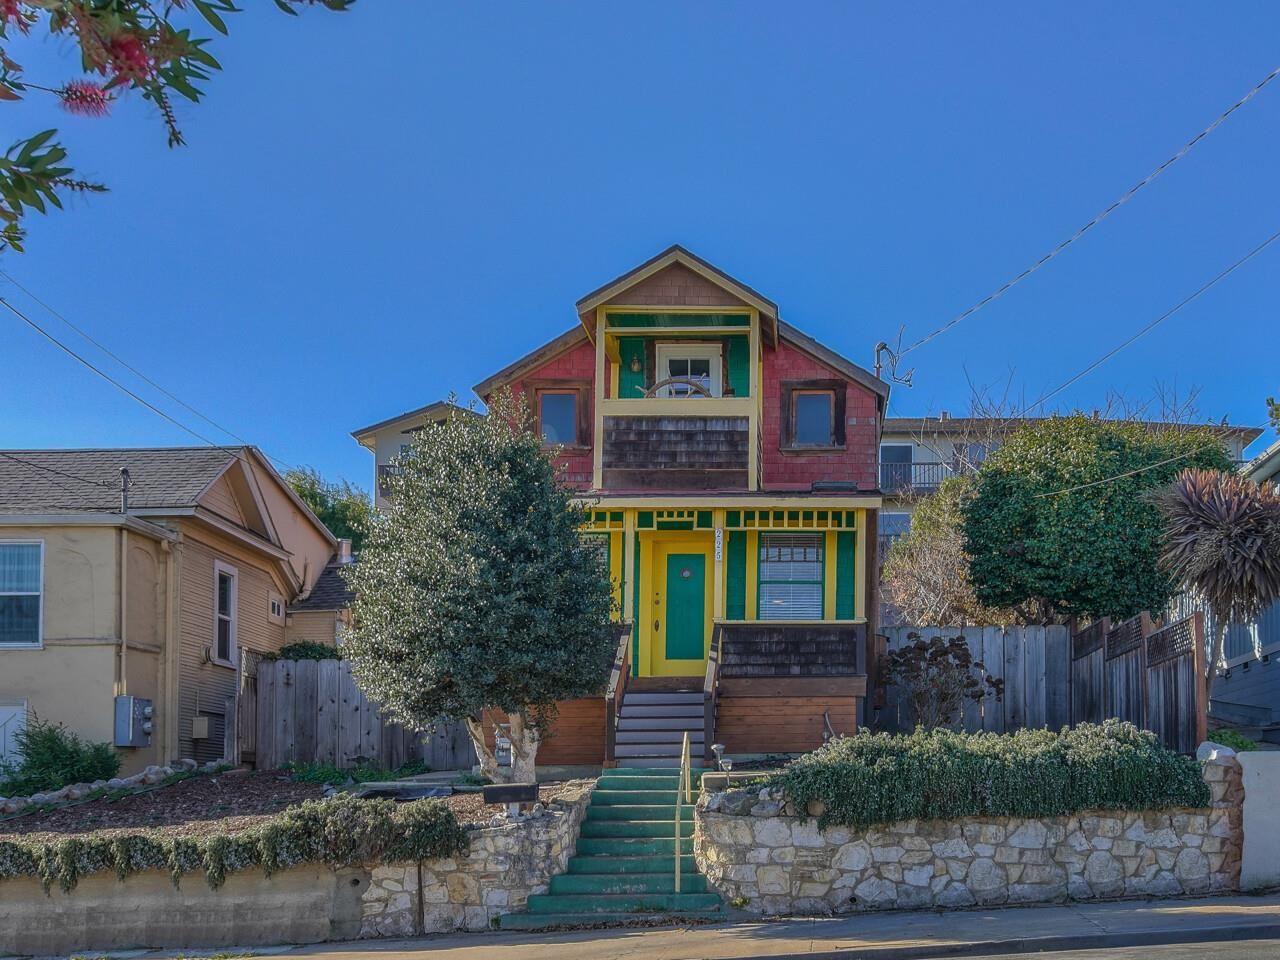 Photo for 225 Hawthorne ST, MONTEREY, CA 93940 (MLS # ML81824020)